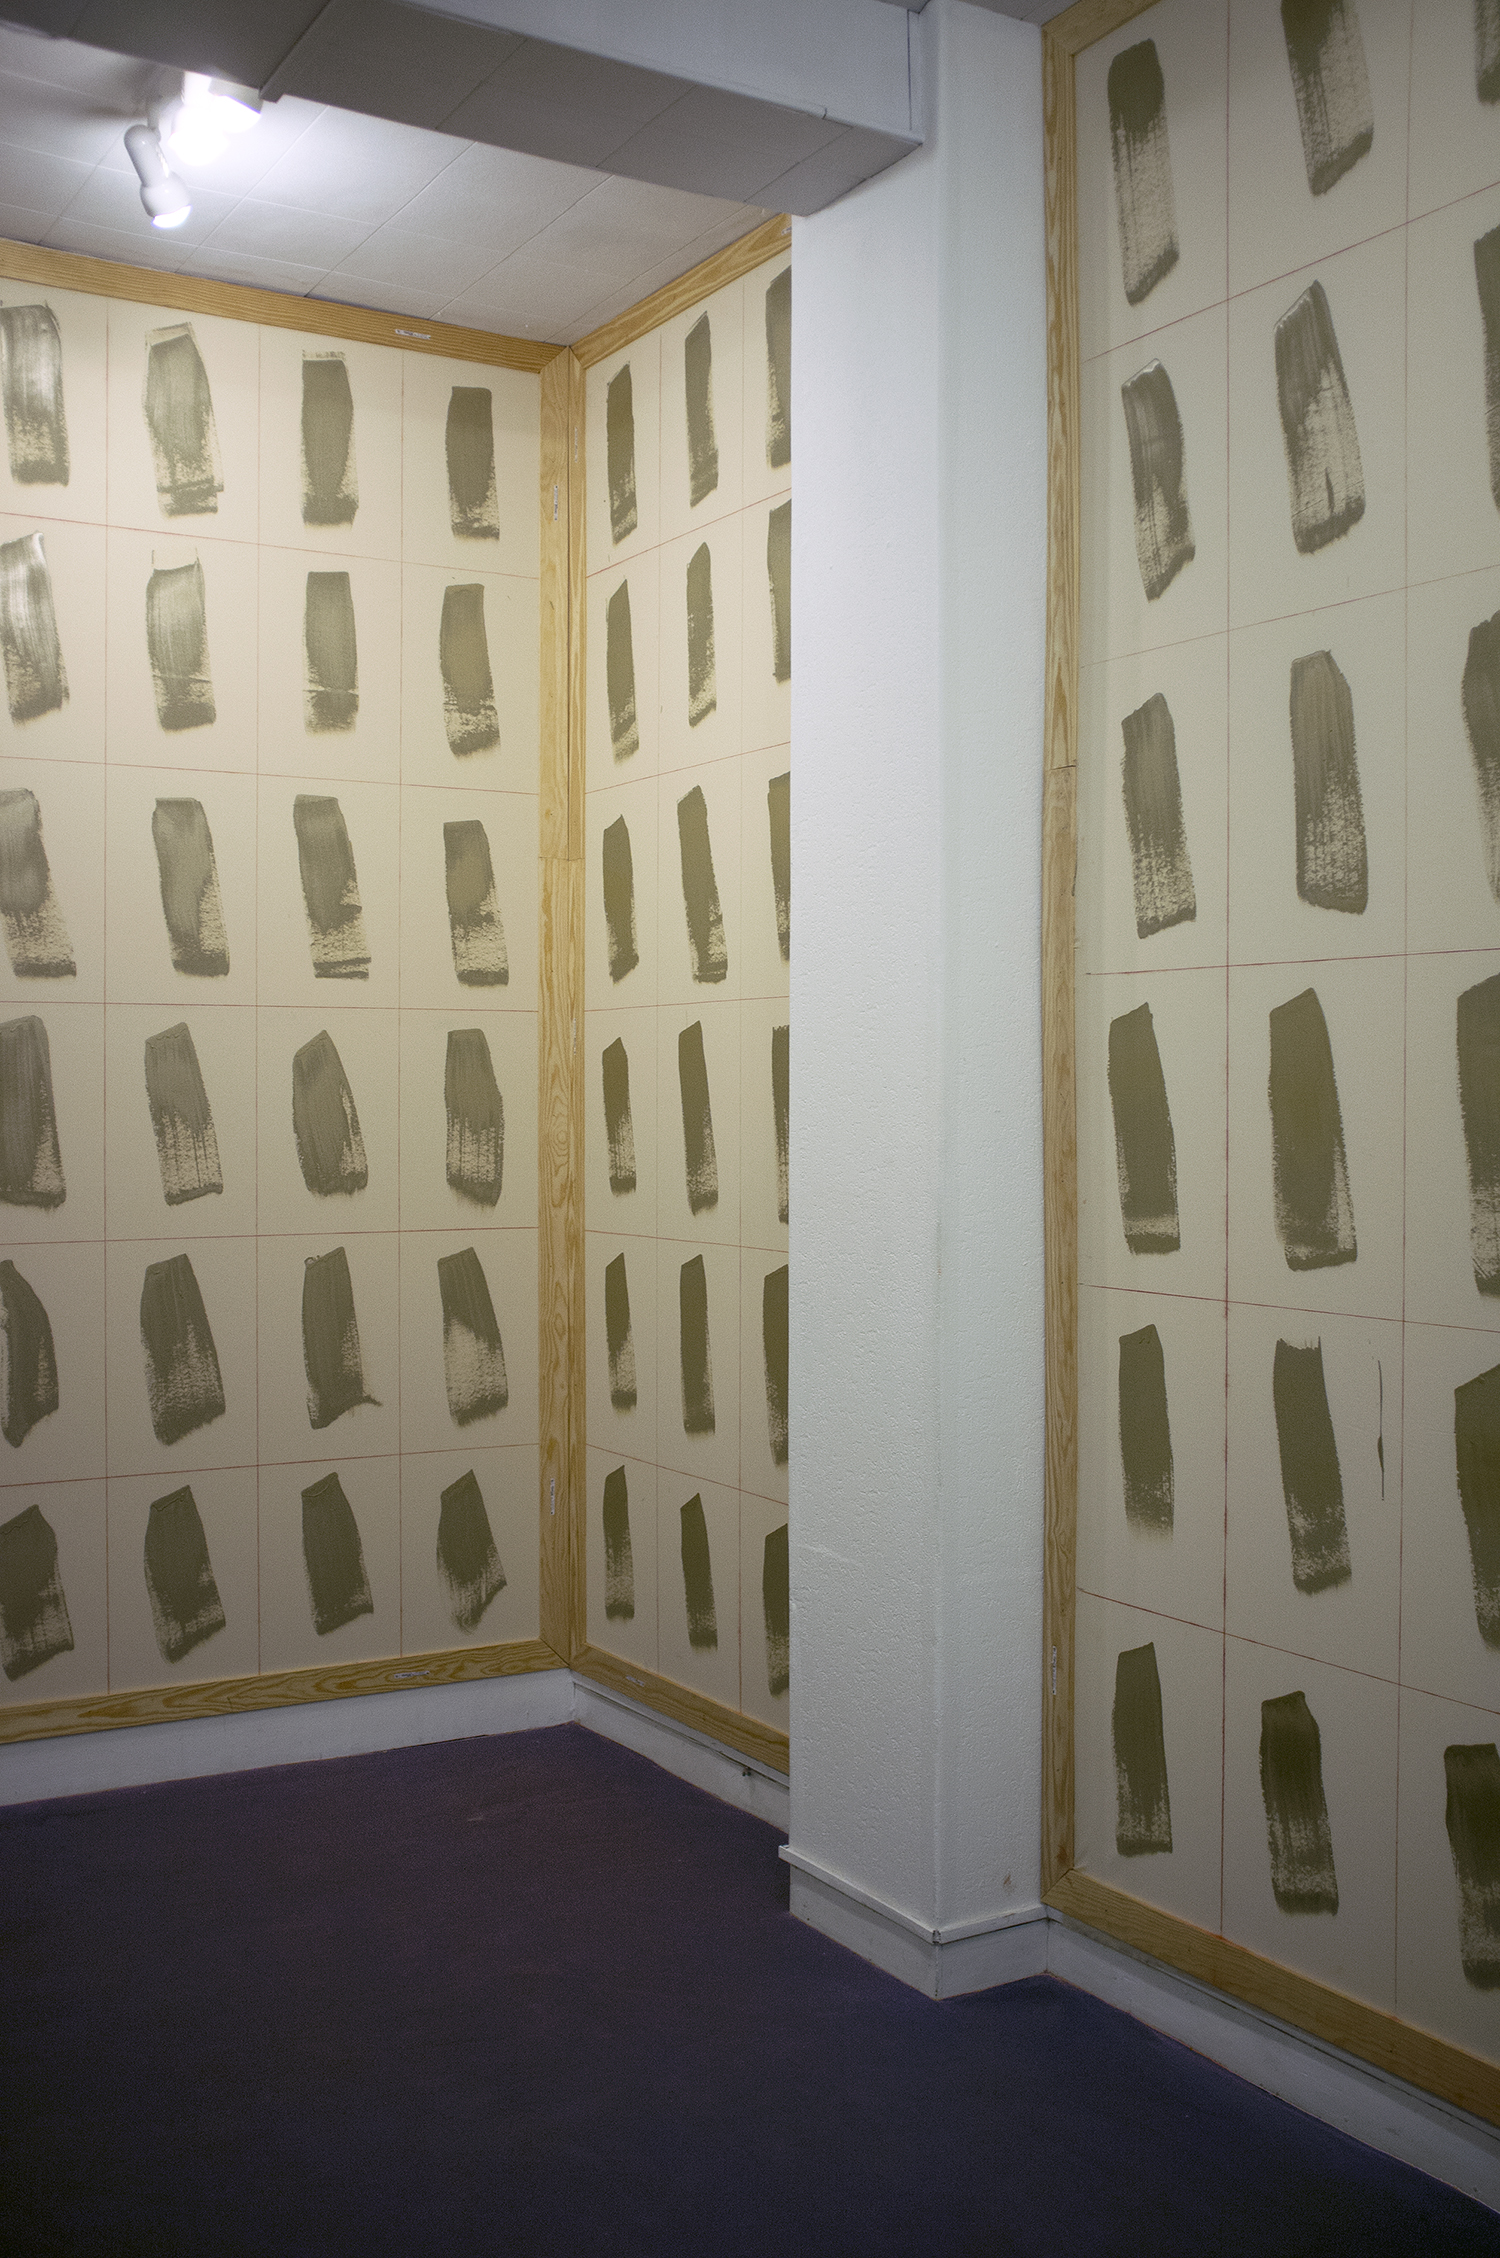 Robert Tombs/ L'Occupation  installation, ParisCONCRET, Paris, France, 2013